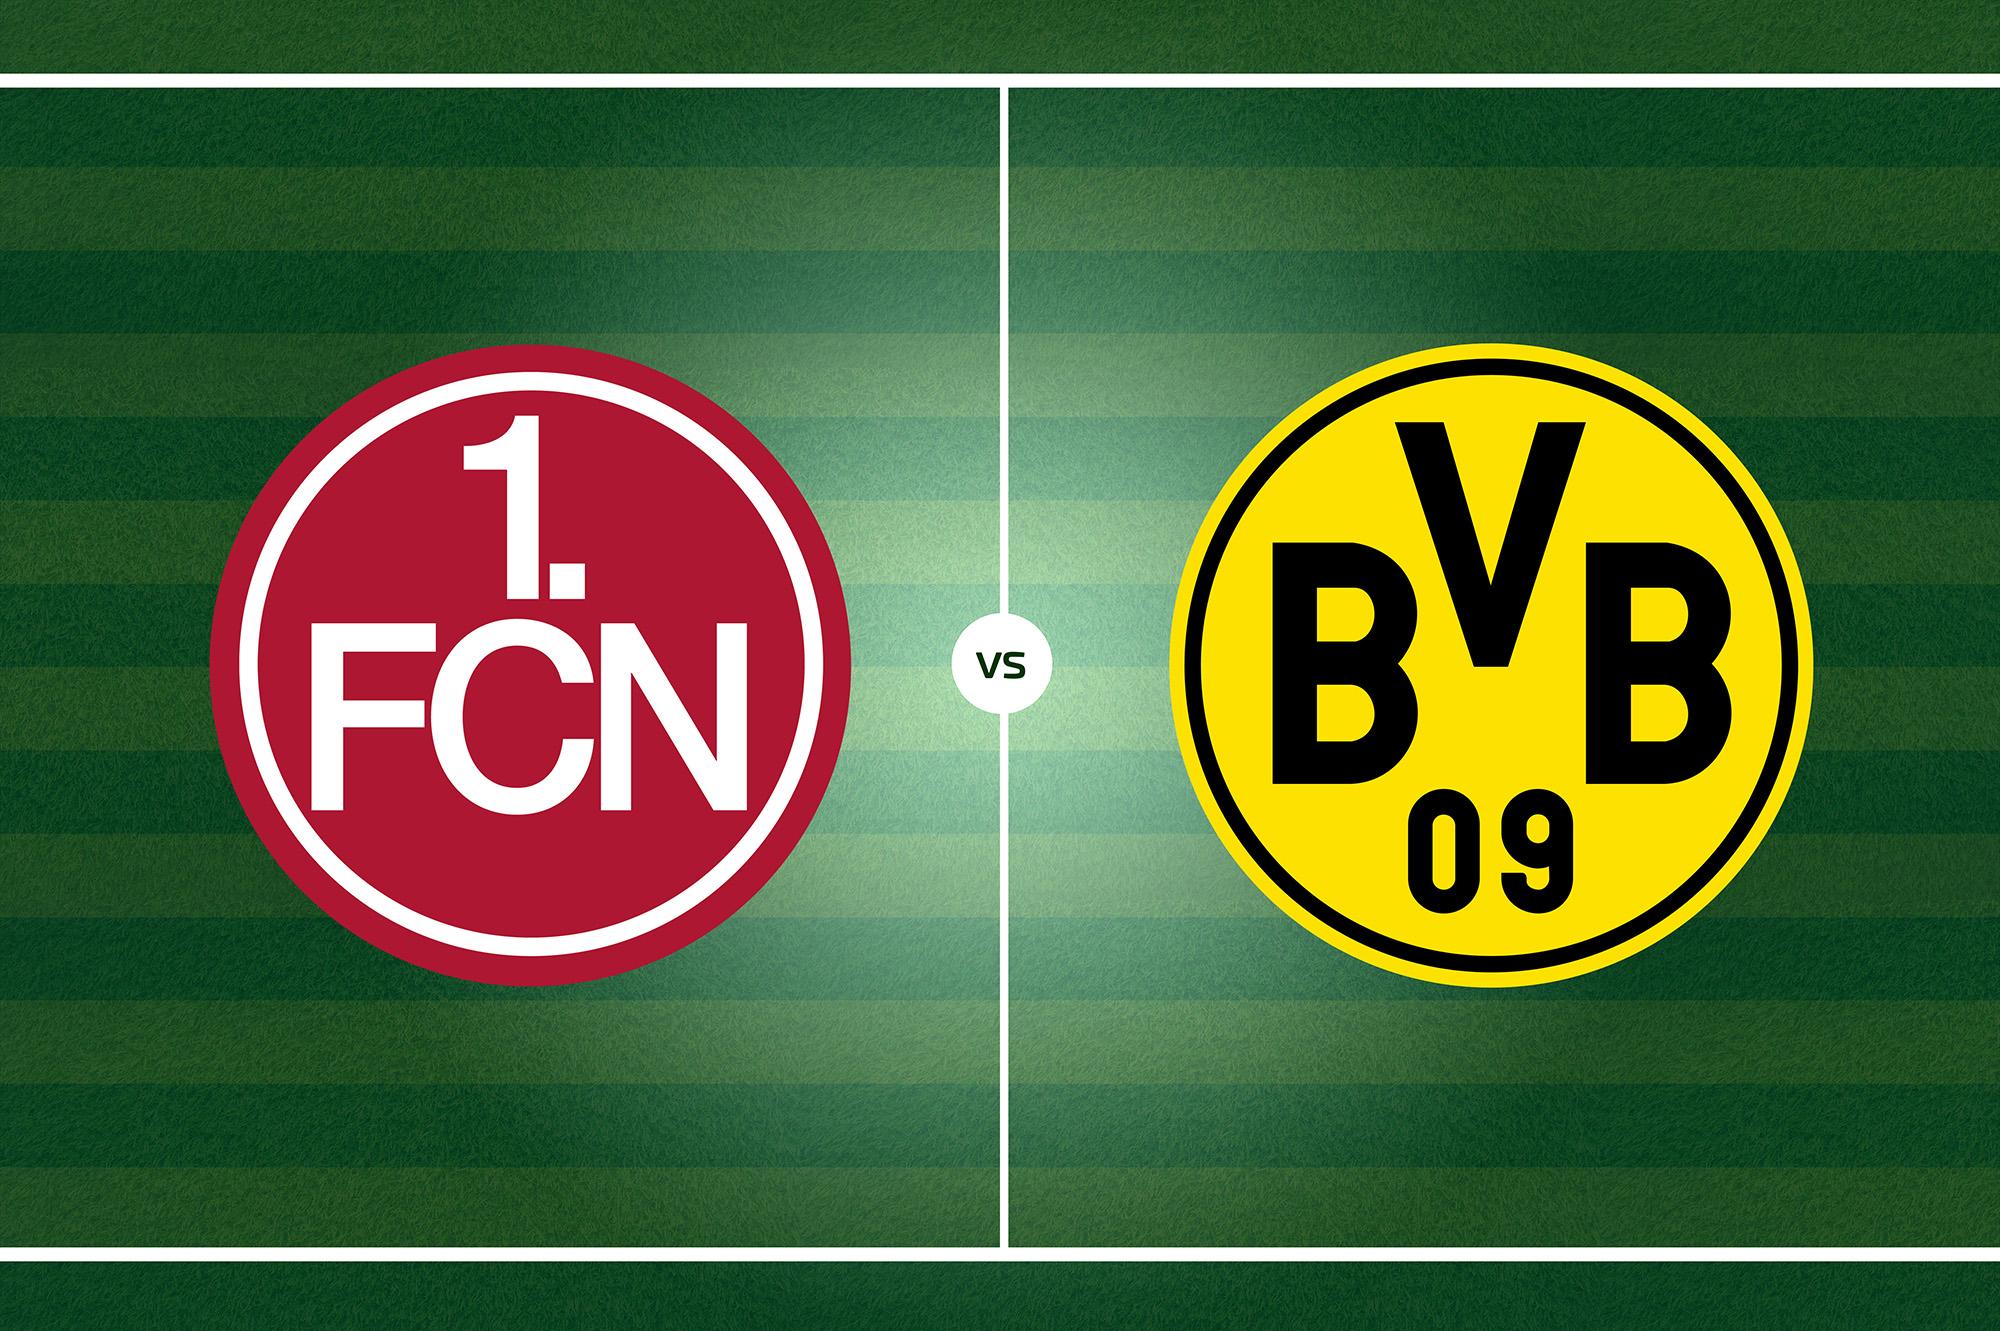 FCN: Logo Bundesliga Bvb